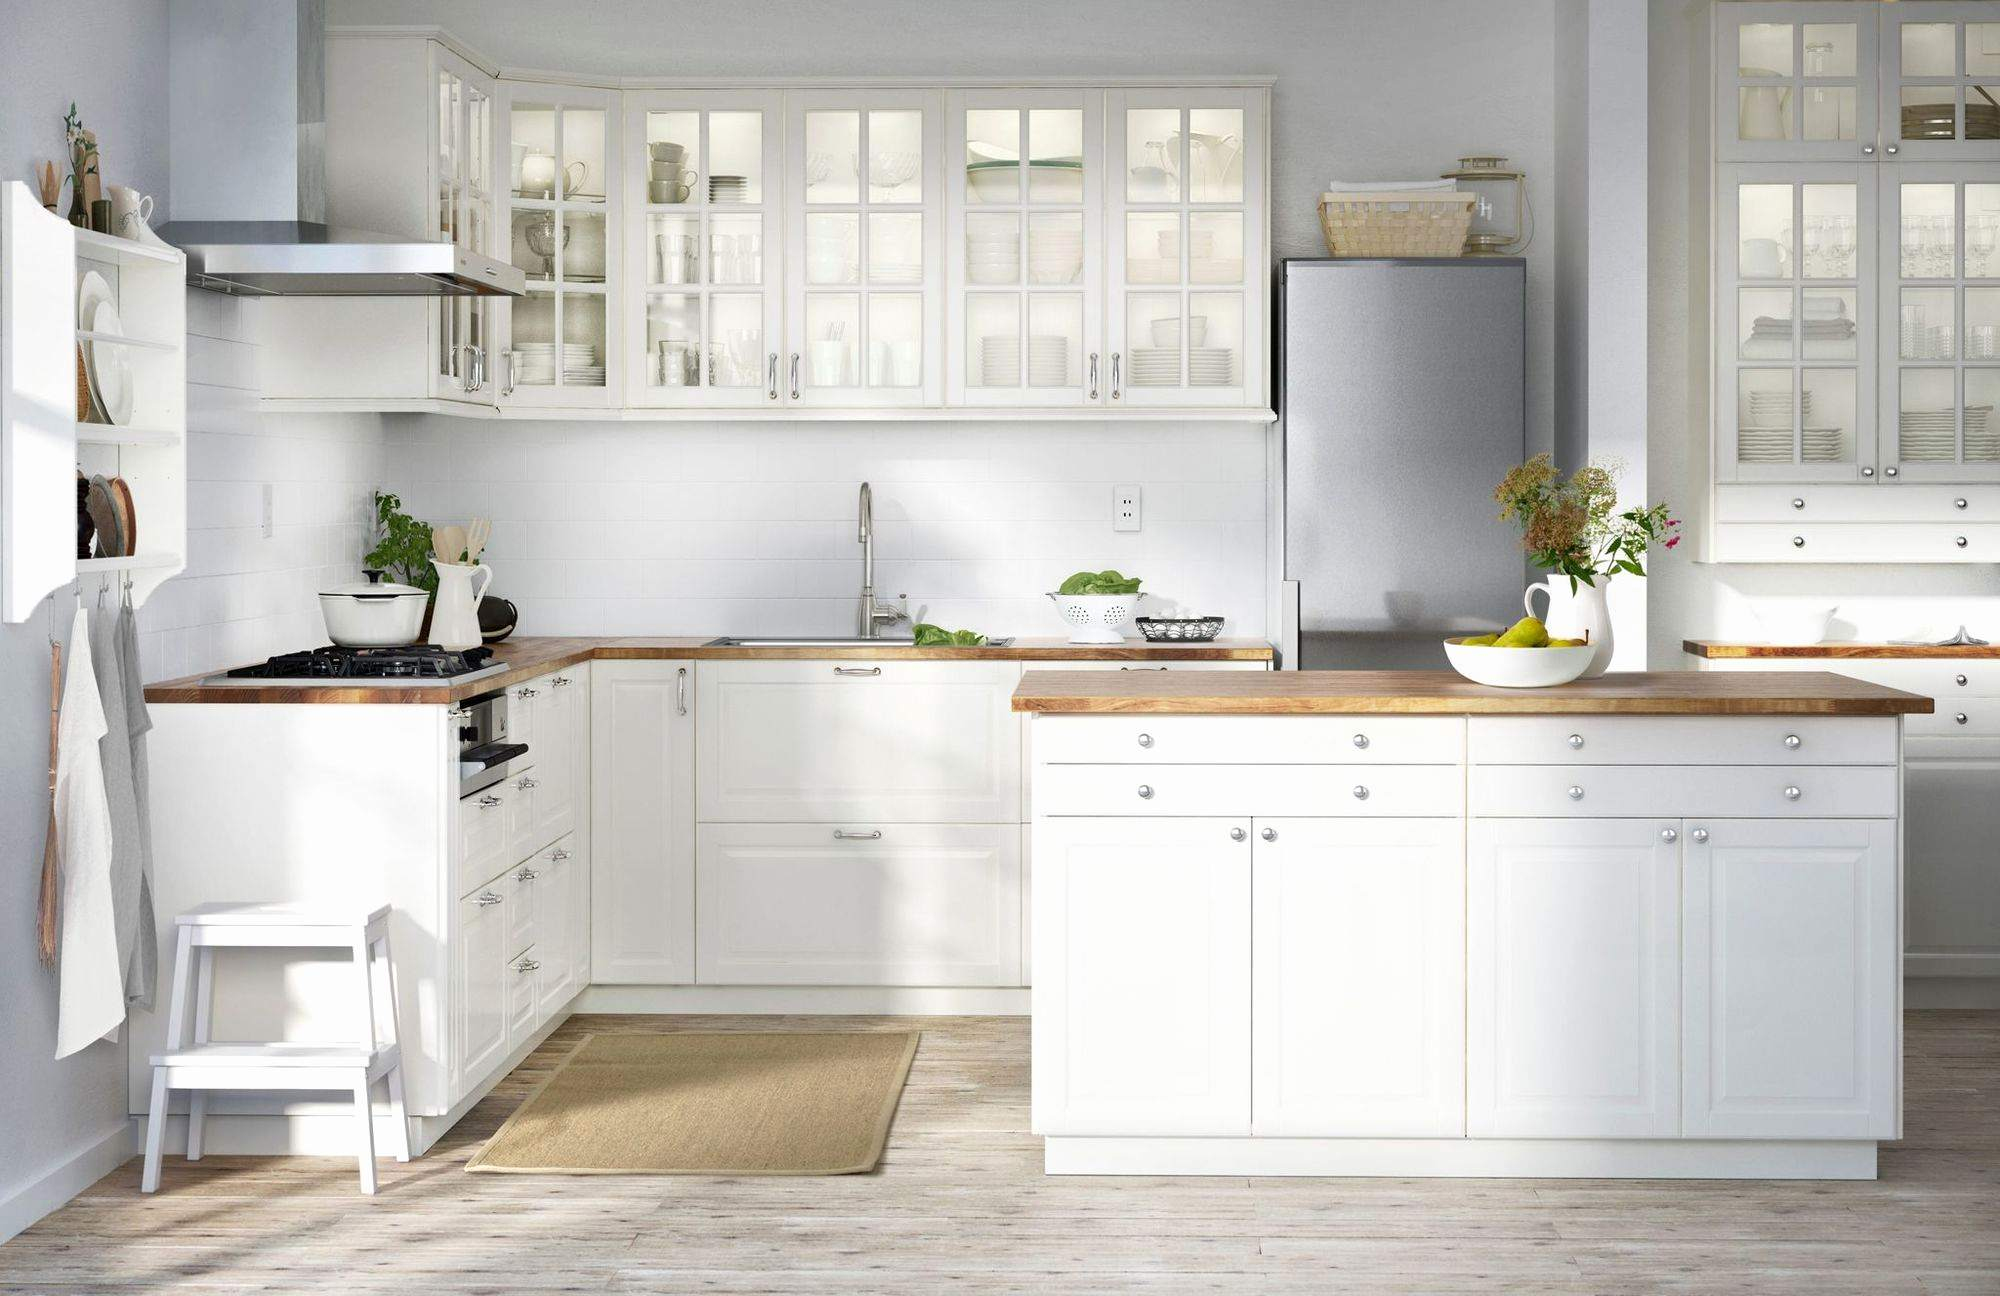 Cuisine Mobalpa Avis 2015 Élégant Collection Cuisine Ikea Avis Meilleur De Meuble Haut Cuisine Leroy Merlin Dans